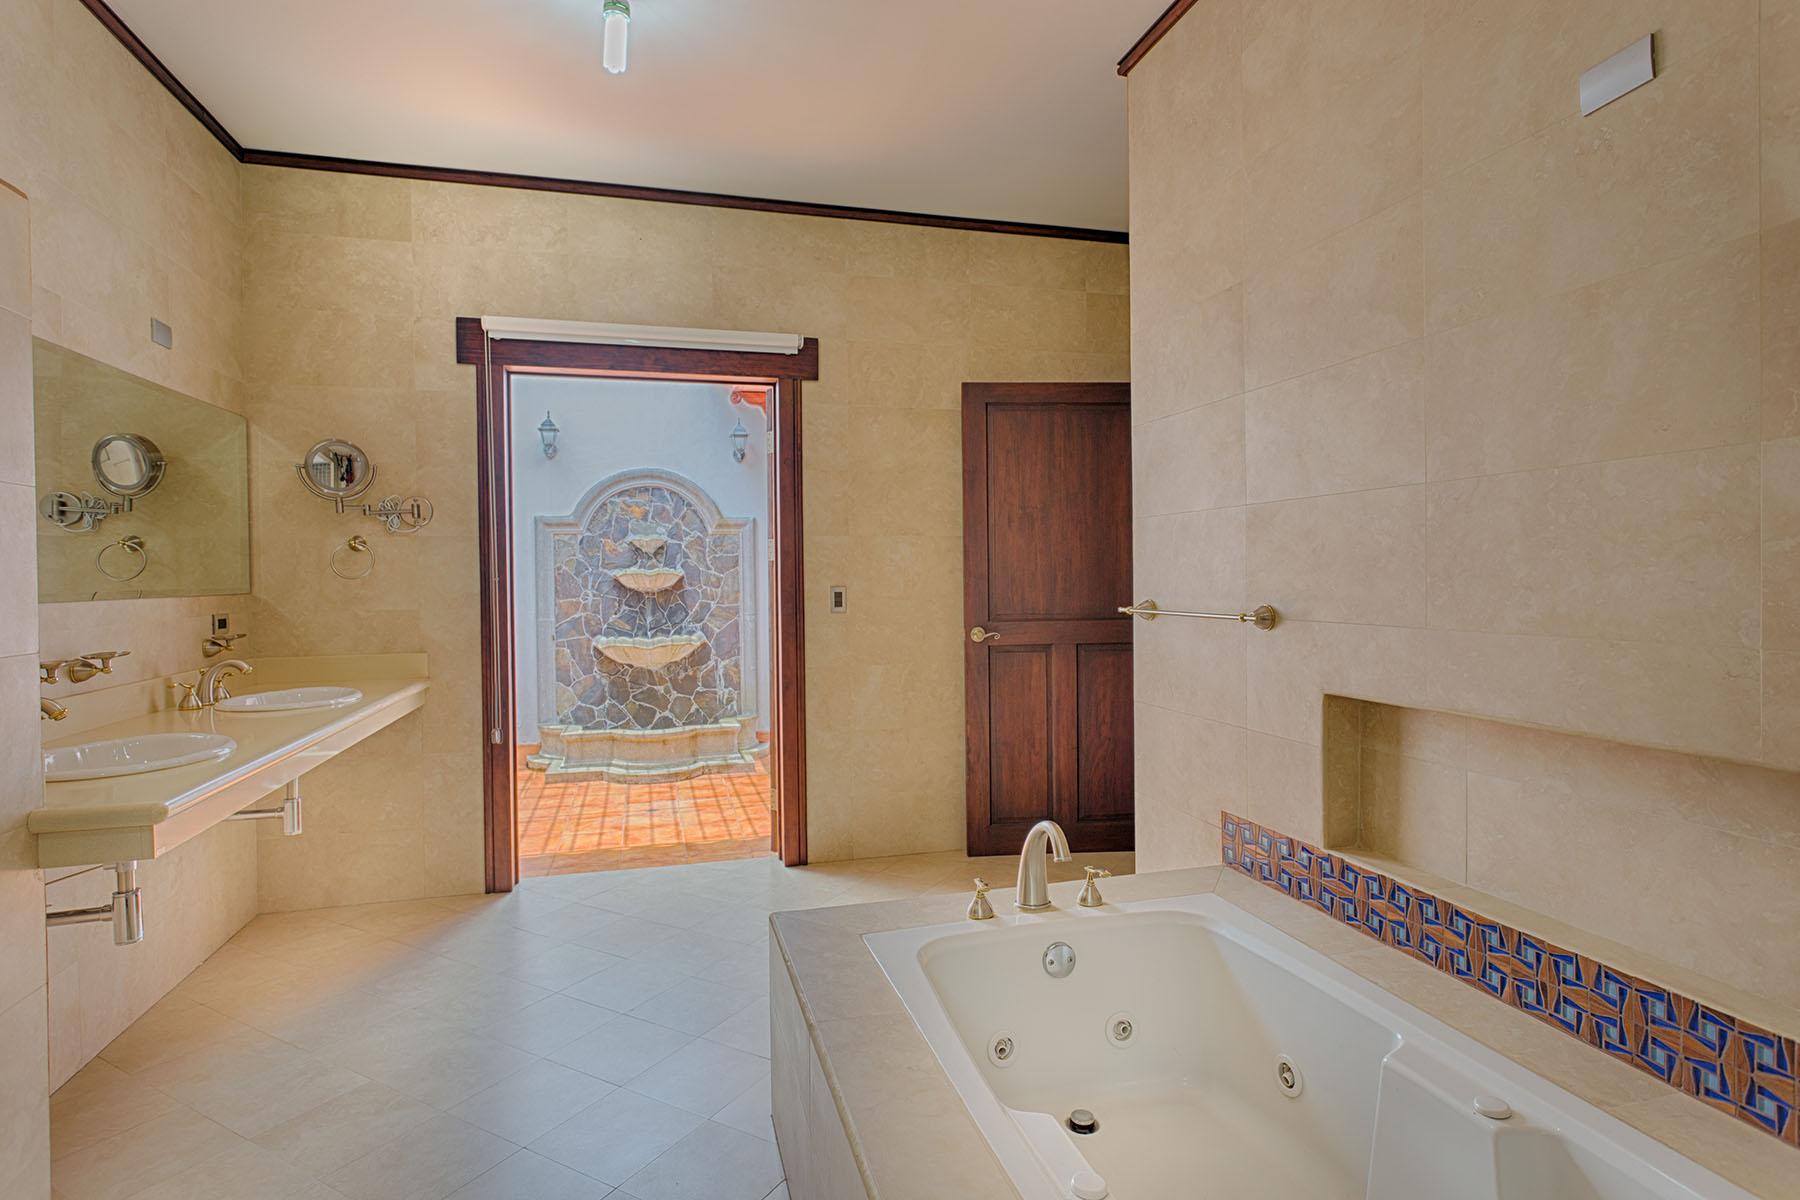 Additional photo for property listing at Refugio del Bosque en el Castillo San Rafael, Heredia Costa Rica